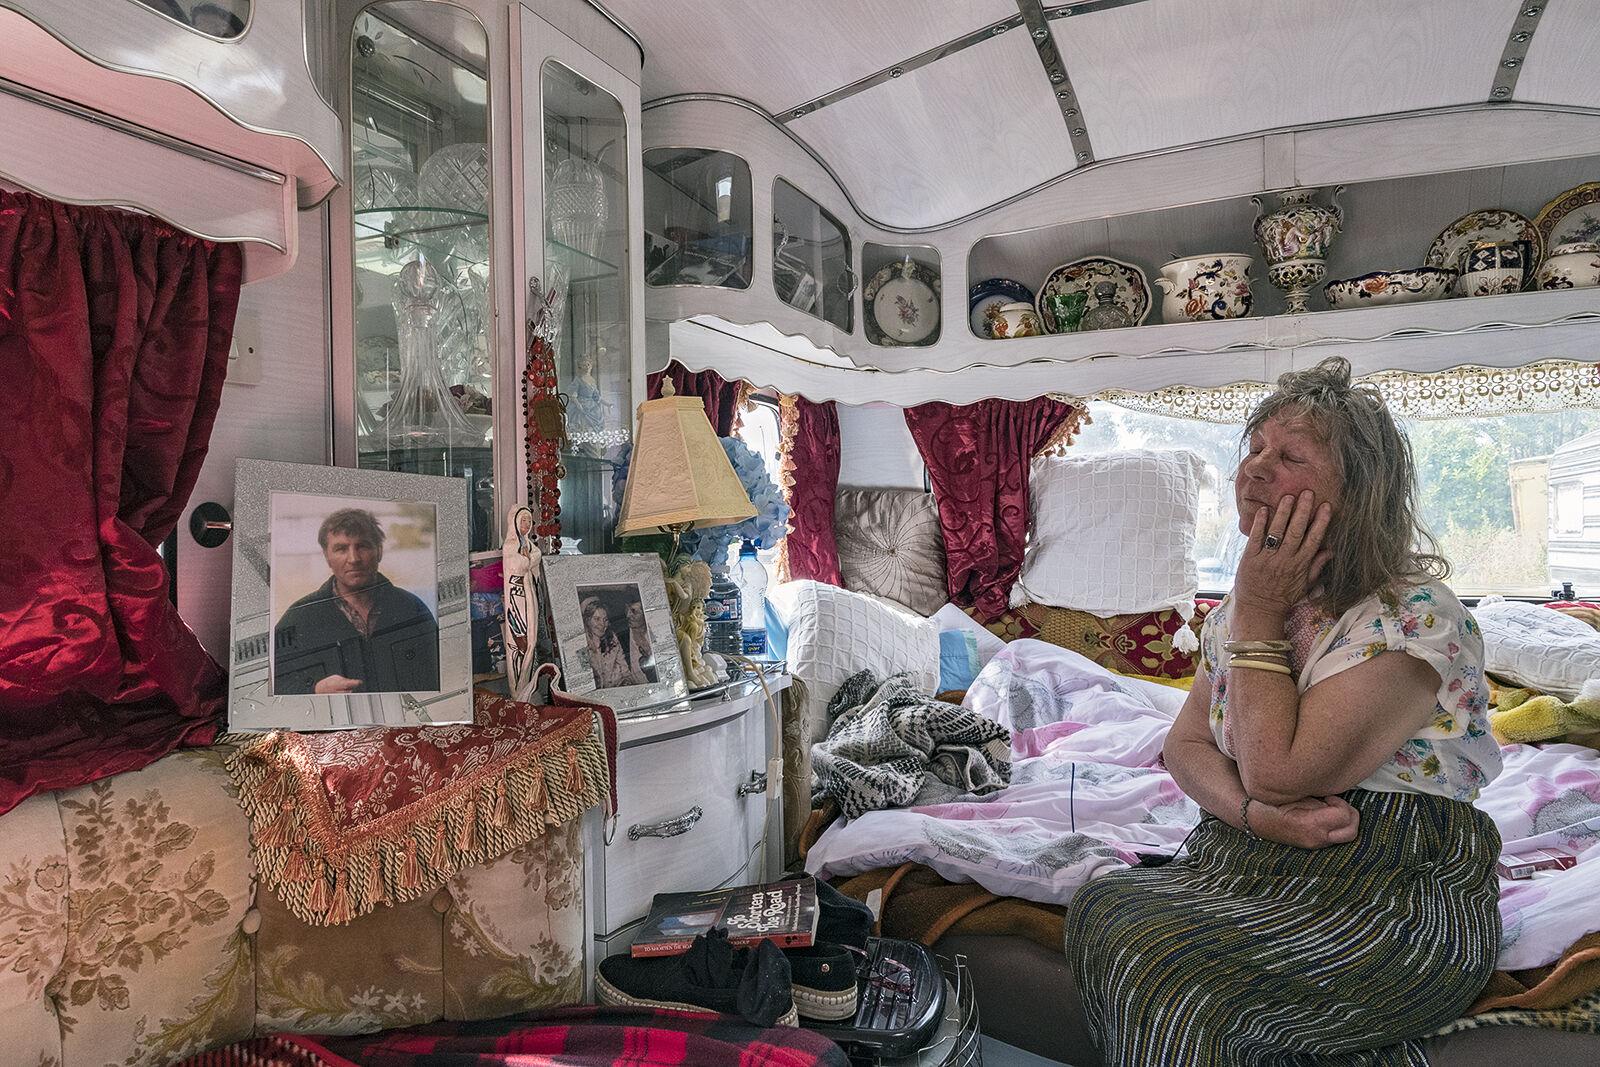 Christina Thinking of Her Recently Deceased Husband, Dublin, Ireland 2019